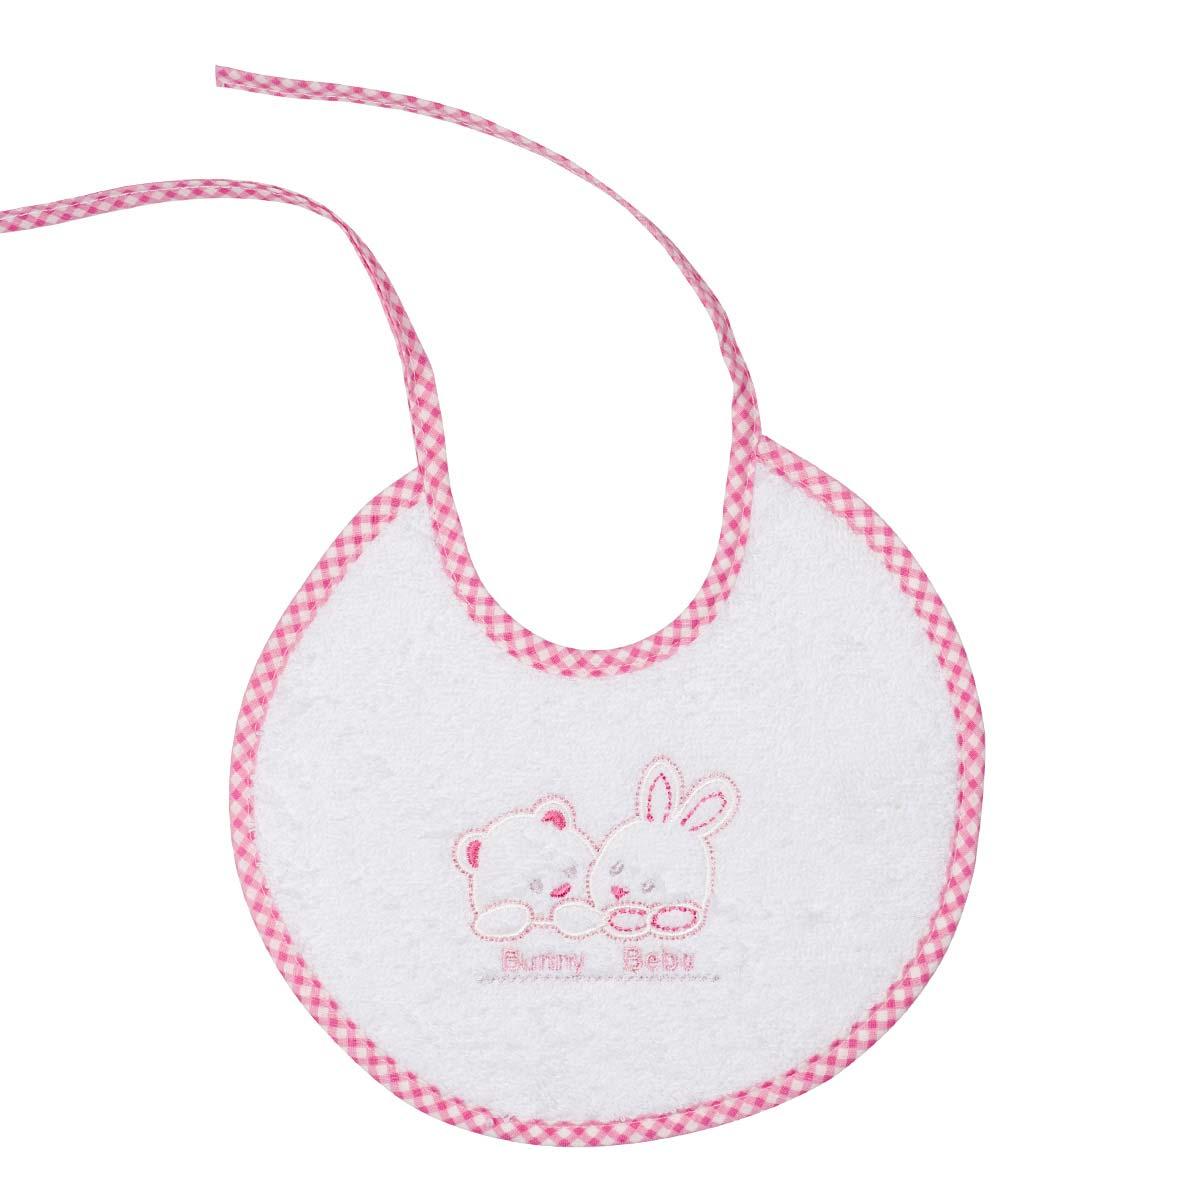 Bunny bebe σαλιάρα πετσετέ με ρέλι αρκουδάκια ροζ